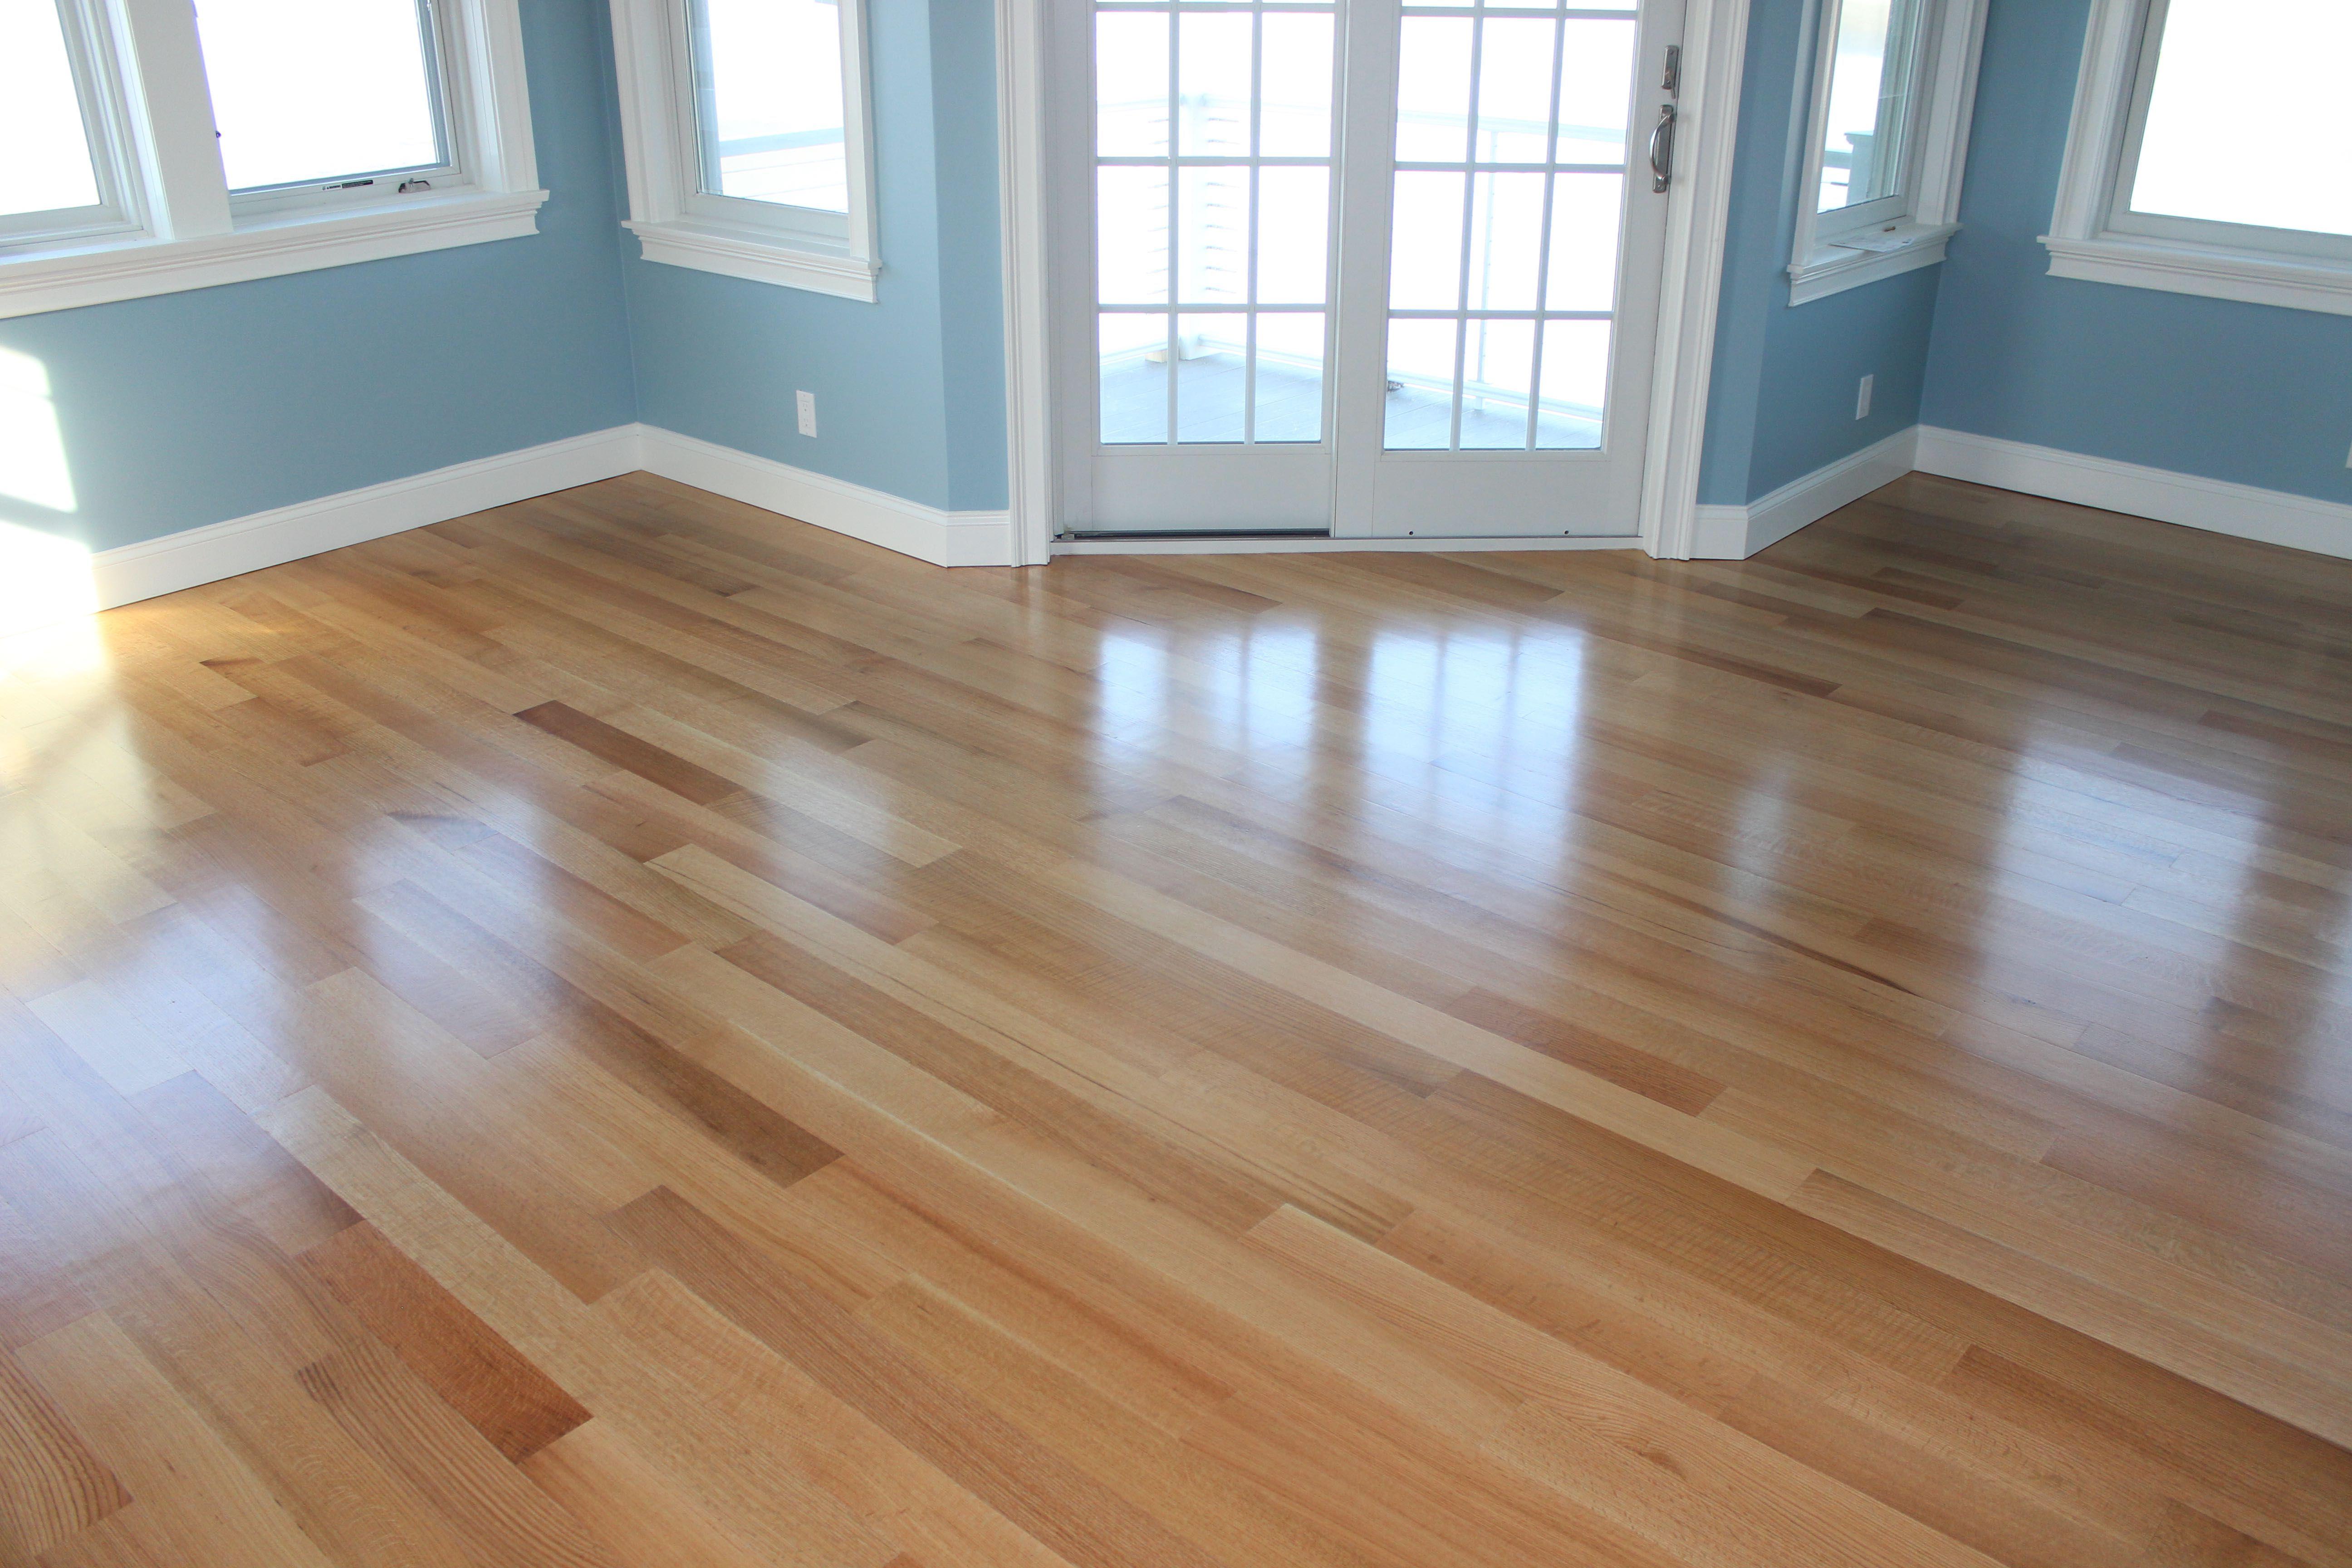 4 Rift And Quarter Sawn Red Oak Hardwood Flooring Top Coated With 3 Coats Of Poloplaz Primero Satin